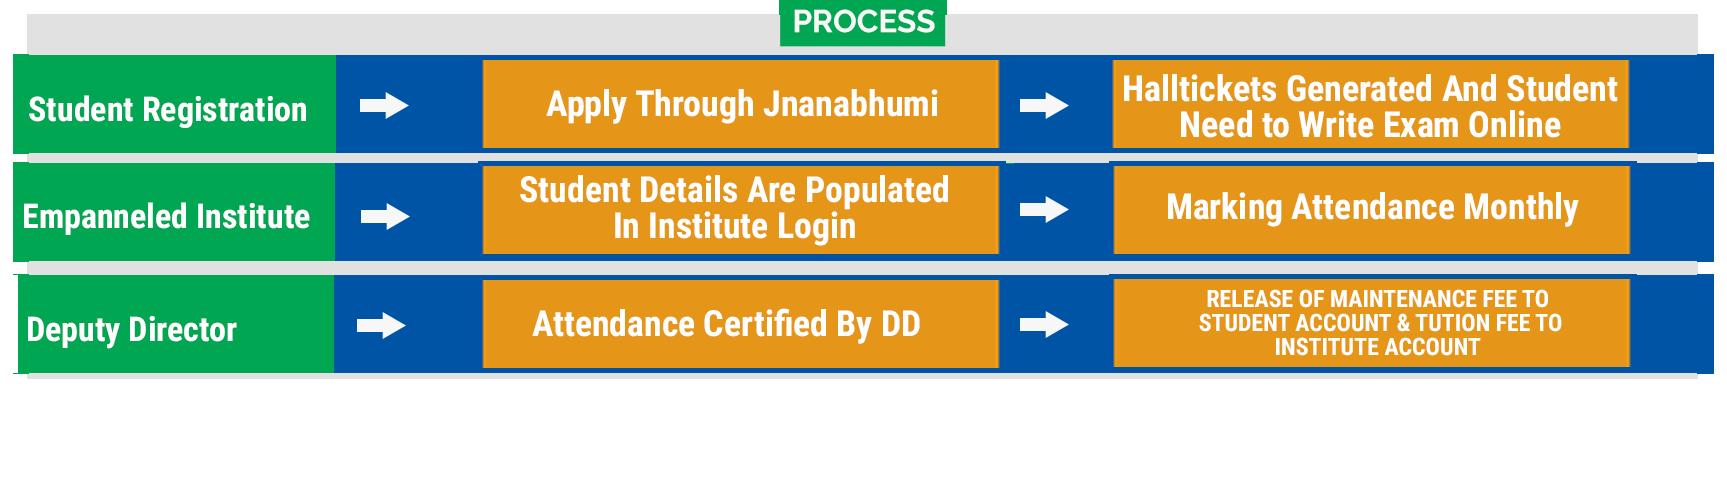 YSR Vidyonnathi Process Flowchart